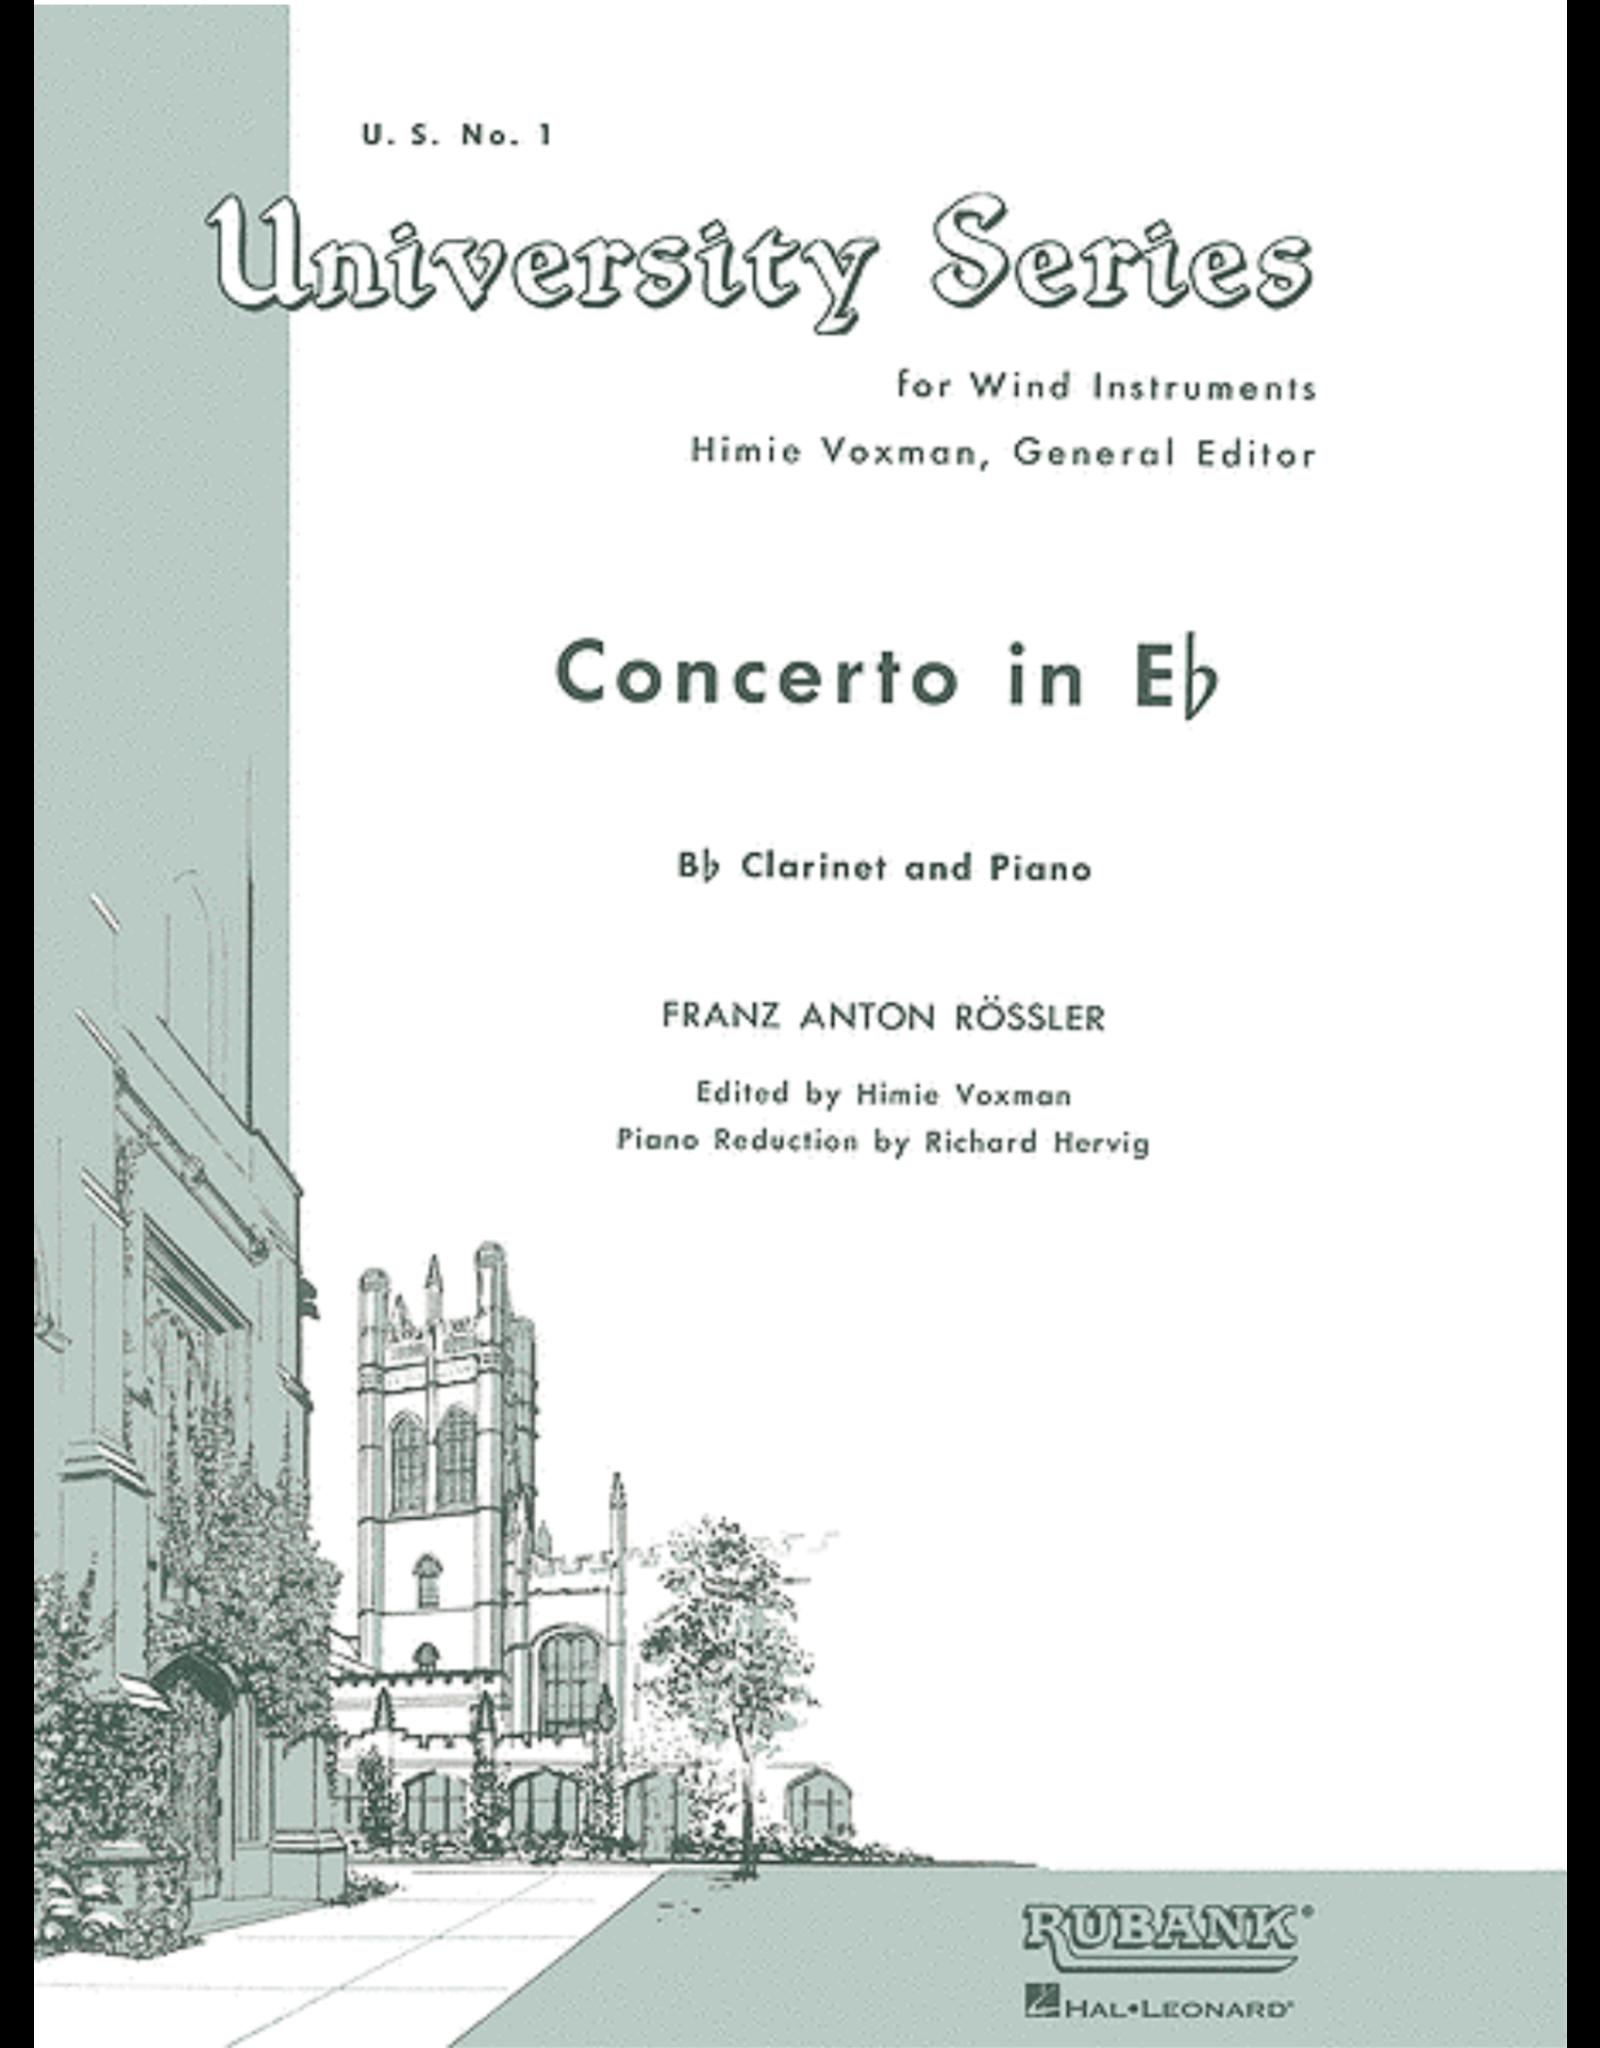 Hal Leonard Anton Rossler - Concerto in E Flat Bb Clarinet Solo with Piano (Arr. Voxman)